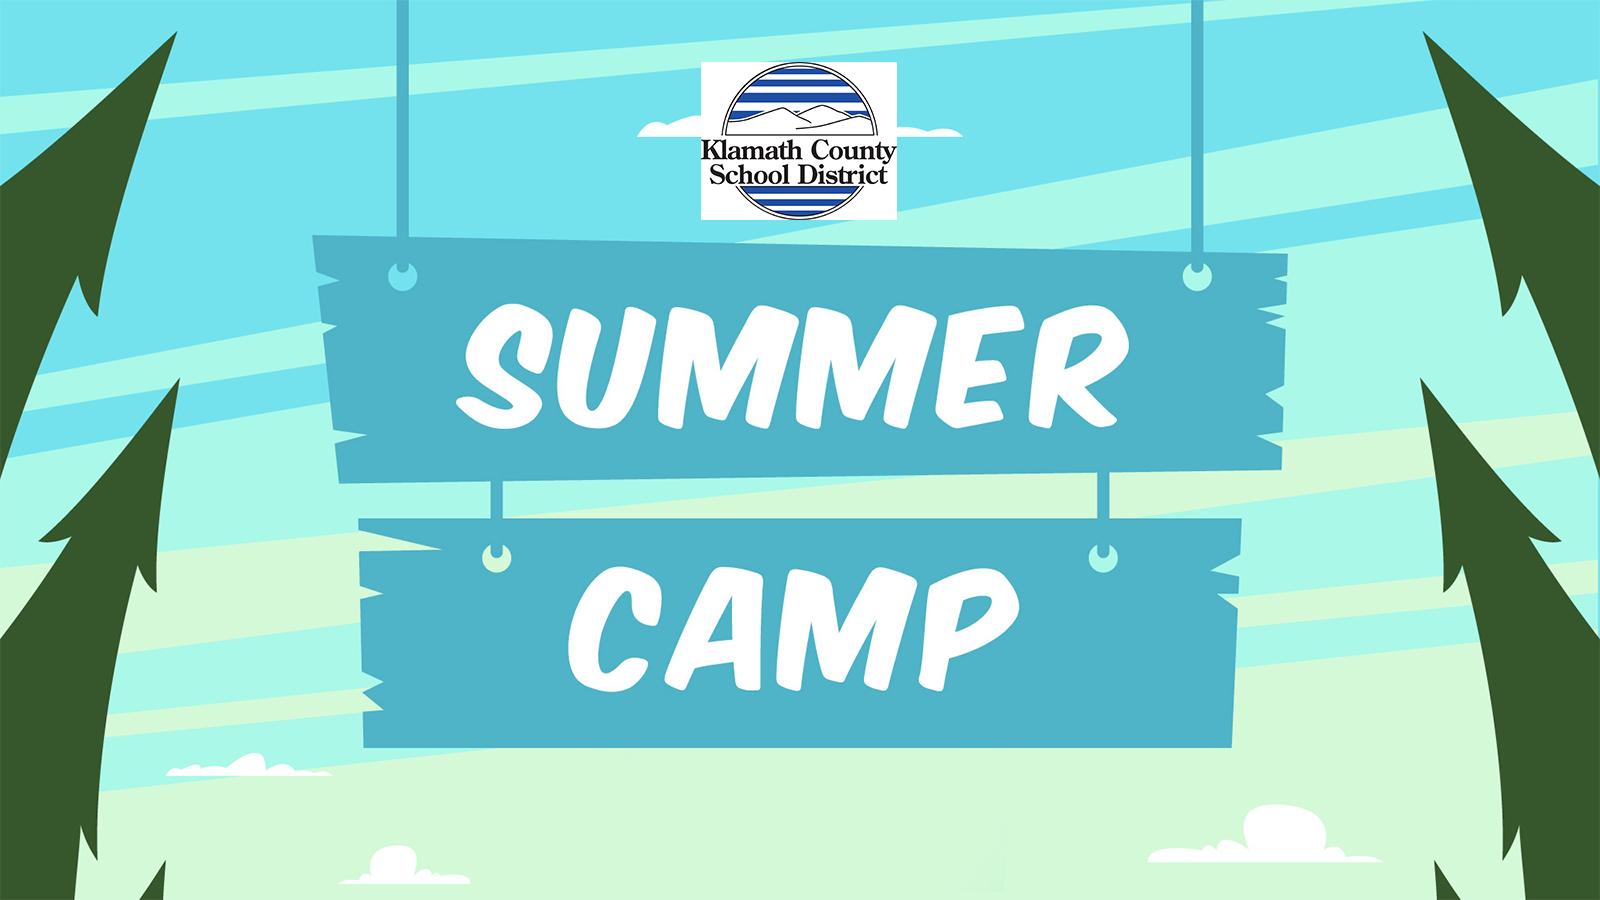 summercamp.jpg